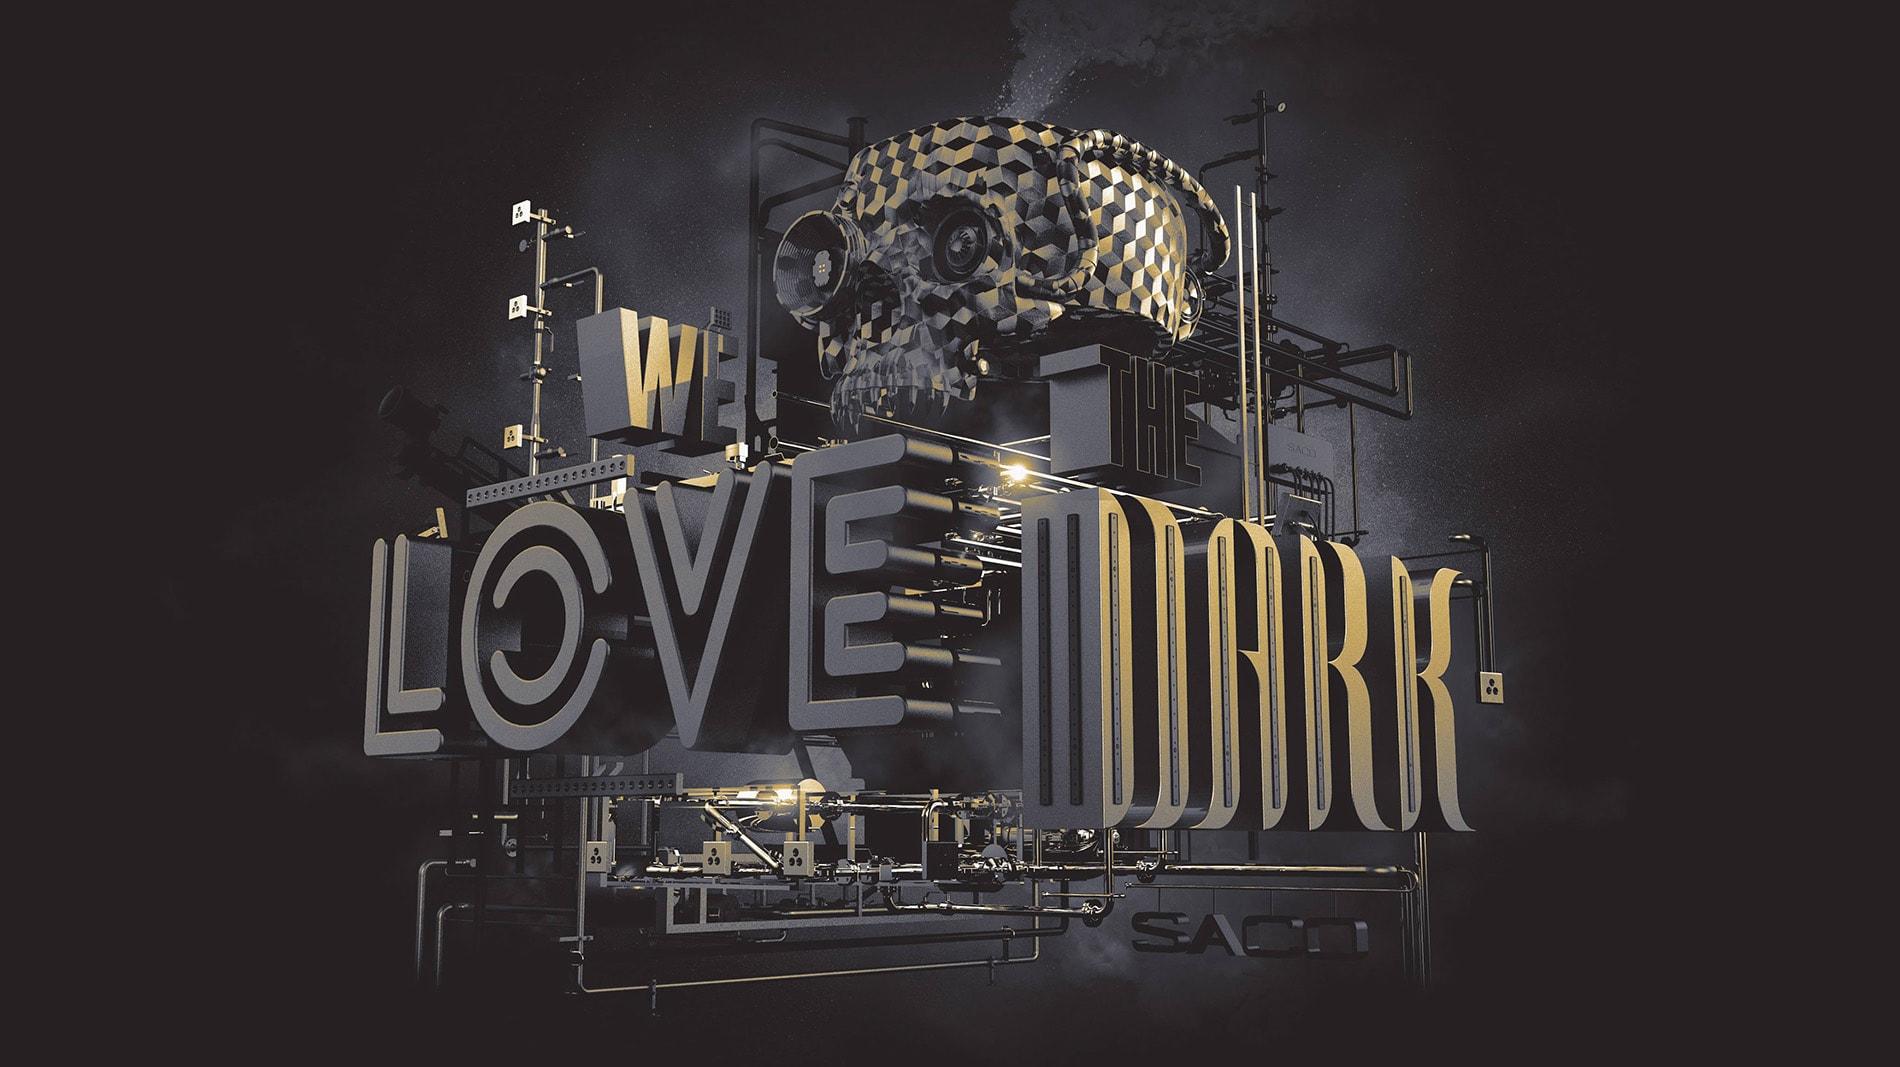 WE LOVE THE DARK WALLPAPER